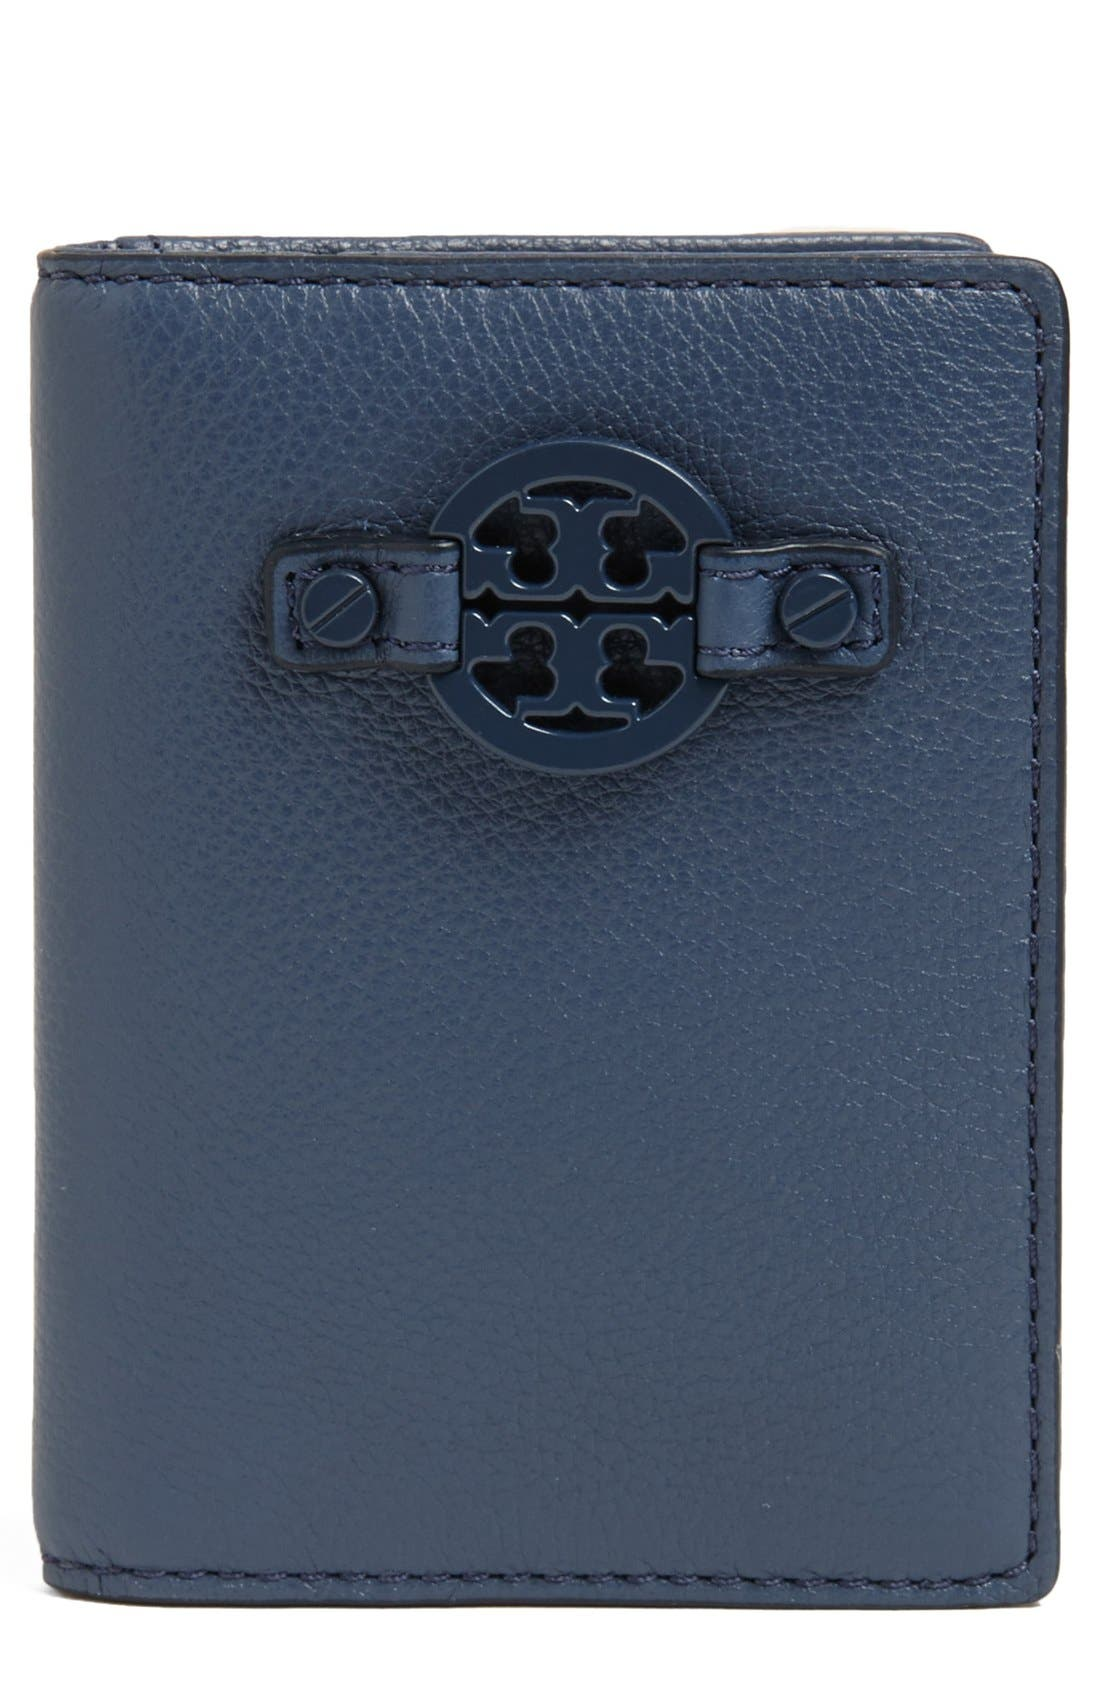 Alternate Image 1 Selected - Tory Burch 'Amanda' Leather Card Case